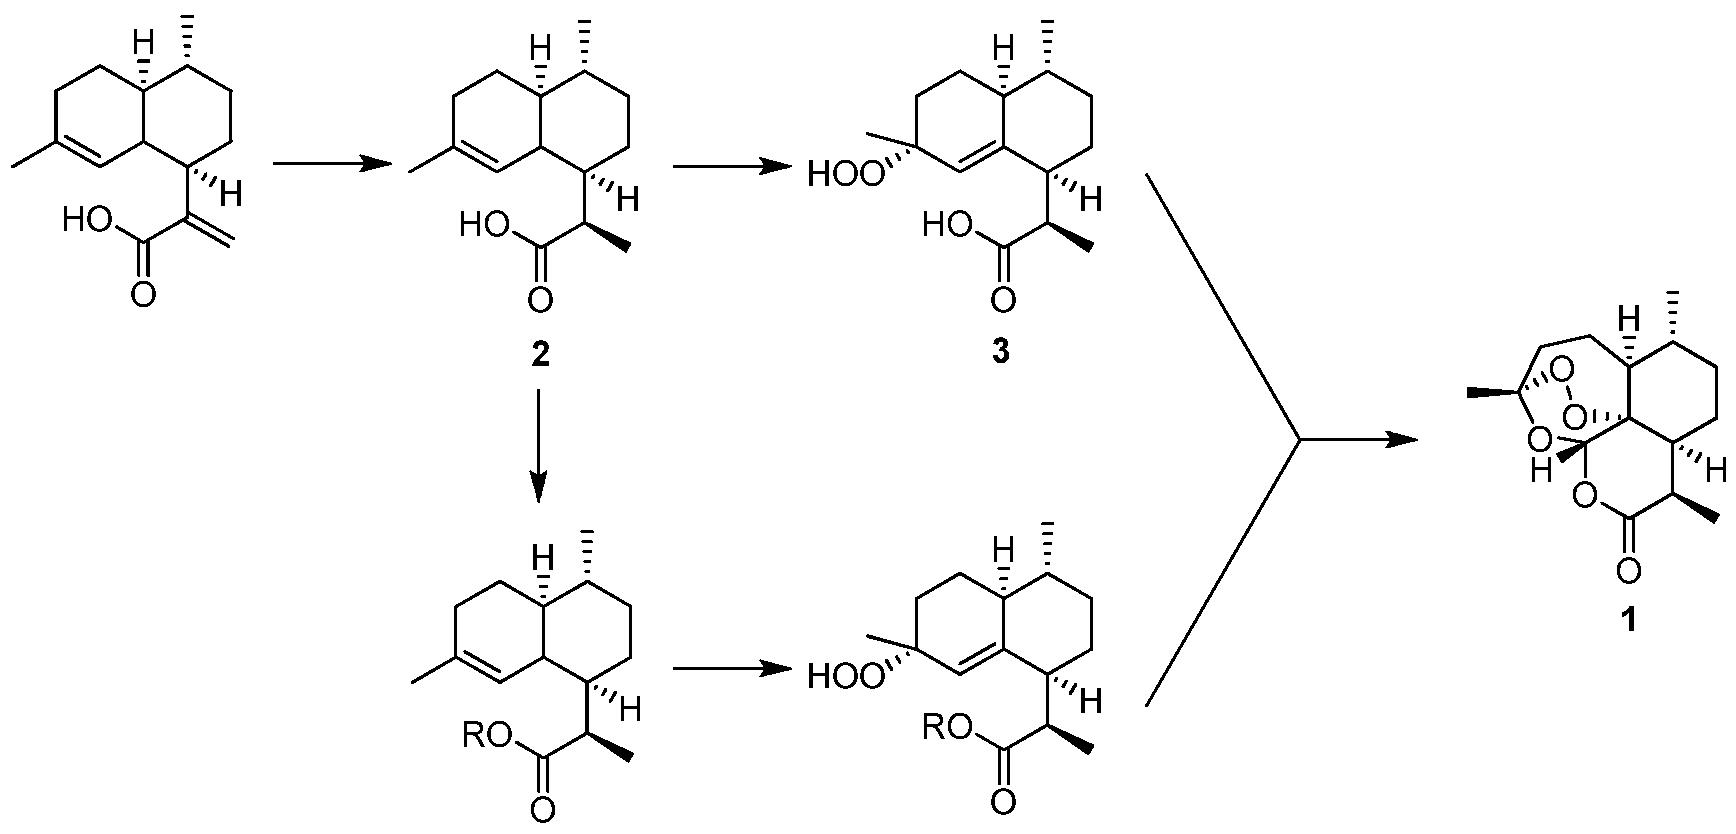 /Rh (427 mmol)加入到 1000 mL乙醇中, 在 25 V、 氢气氛围中(50 bar)反应 12小时。 反应混合物经硅藻土过滤, 旋蒸除去 有机溶剂, 得白色固体 (99 g, 98%)。 ( 2 ) 二氢青蒿酸衍生物 4的合成 二氢青蒿酸(99 g, 420 mmol) 二异丙基乙胺(6. 3 mol)加入到 1000 mL二 氯甲垸中。 -50 C下向体系中加入烯丙基溴 (4.